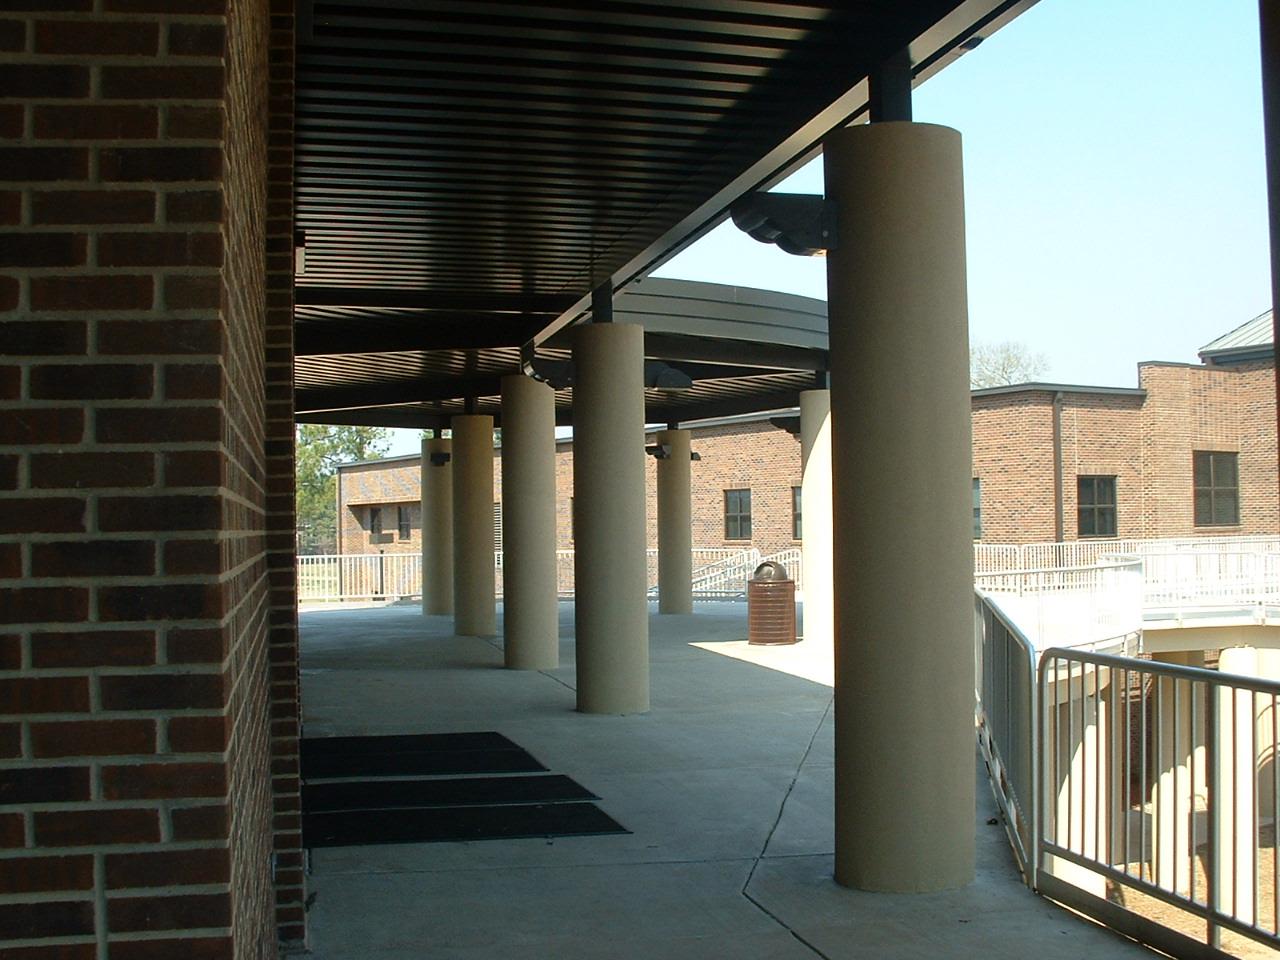 Ittwamba Community College, Fulton MS (3)